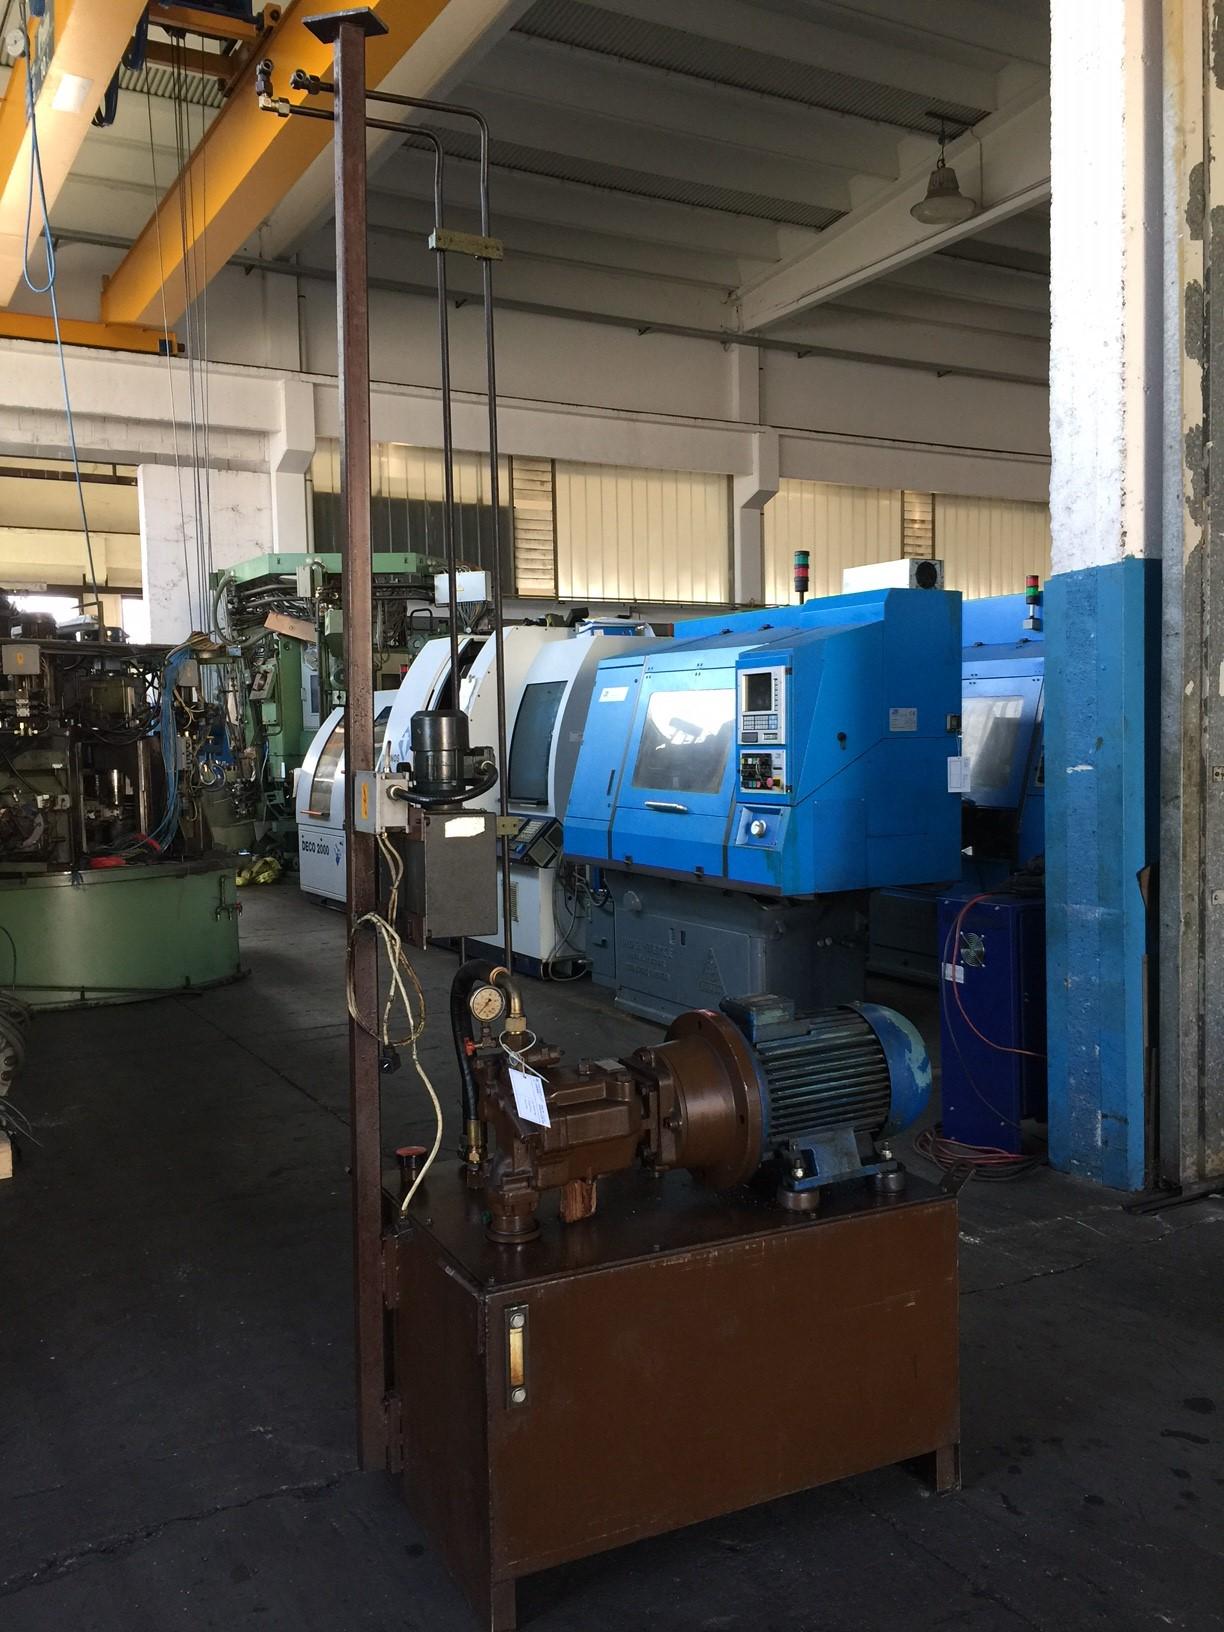 Lot 43 - Amca Model 95266 Transfer Machine